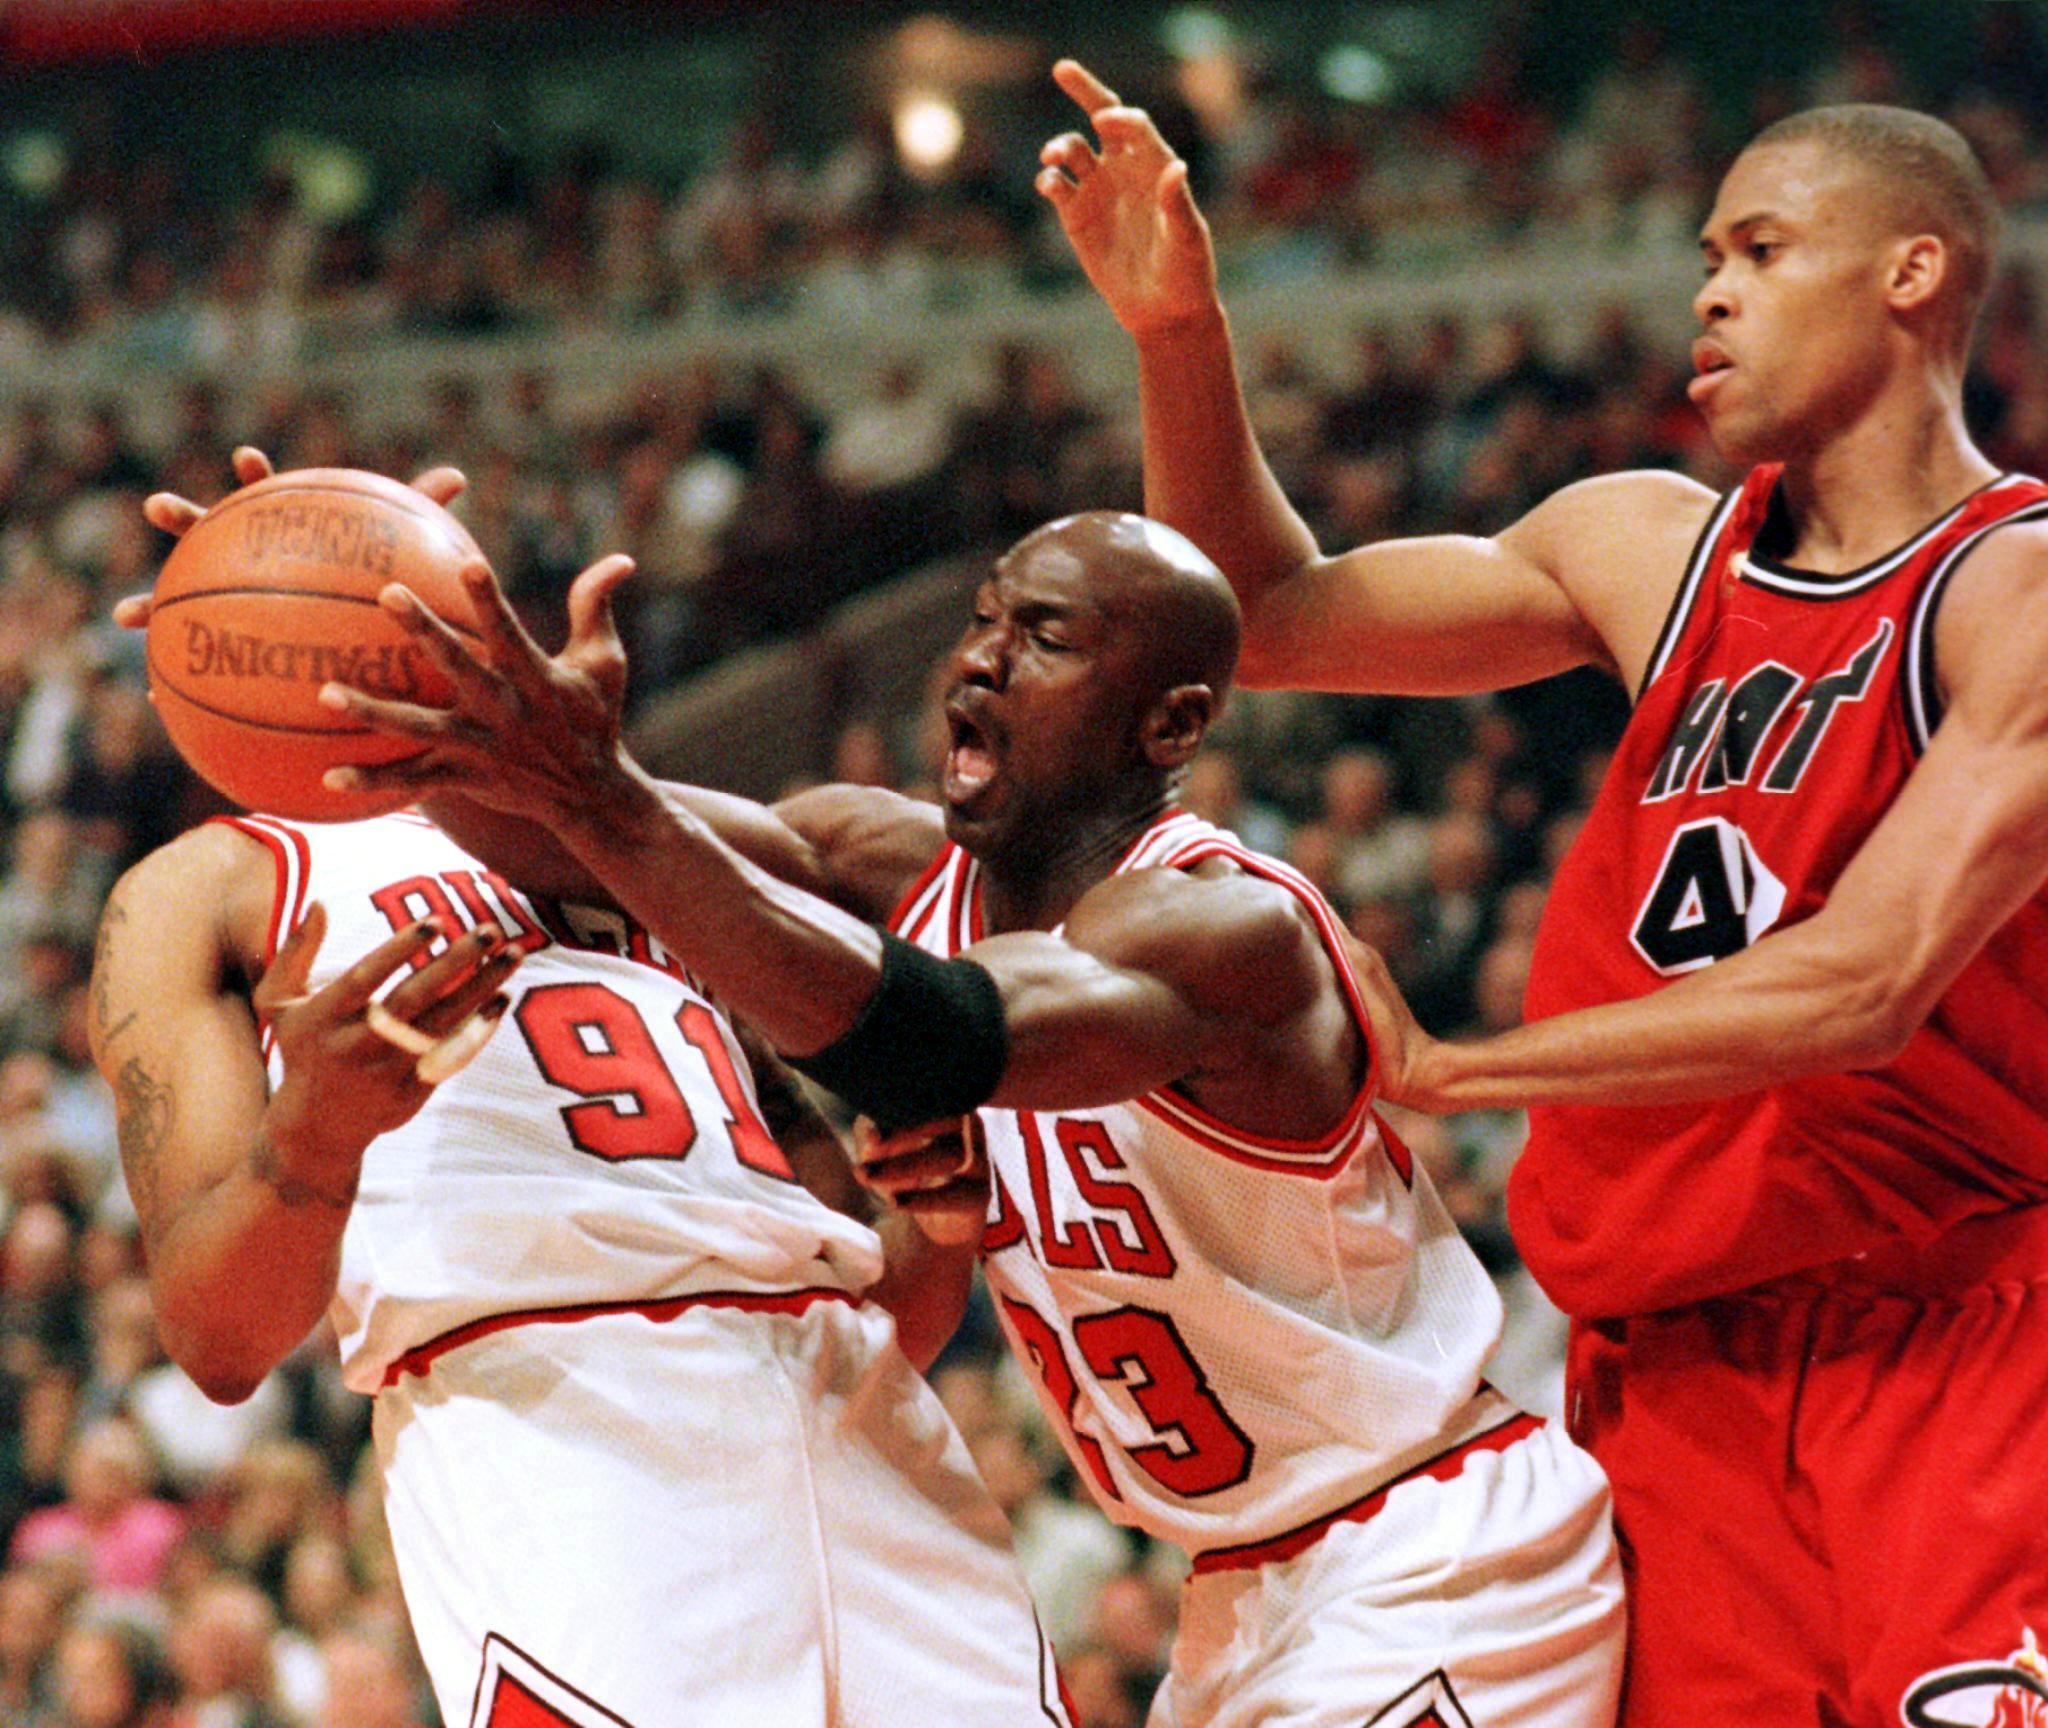 Michael Jordan's Intense Competitive Fire Peaked When He Shot Pool With UNC Teammate Matt Doherty